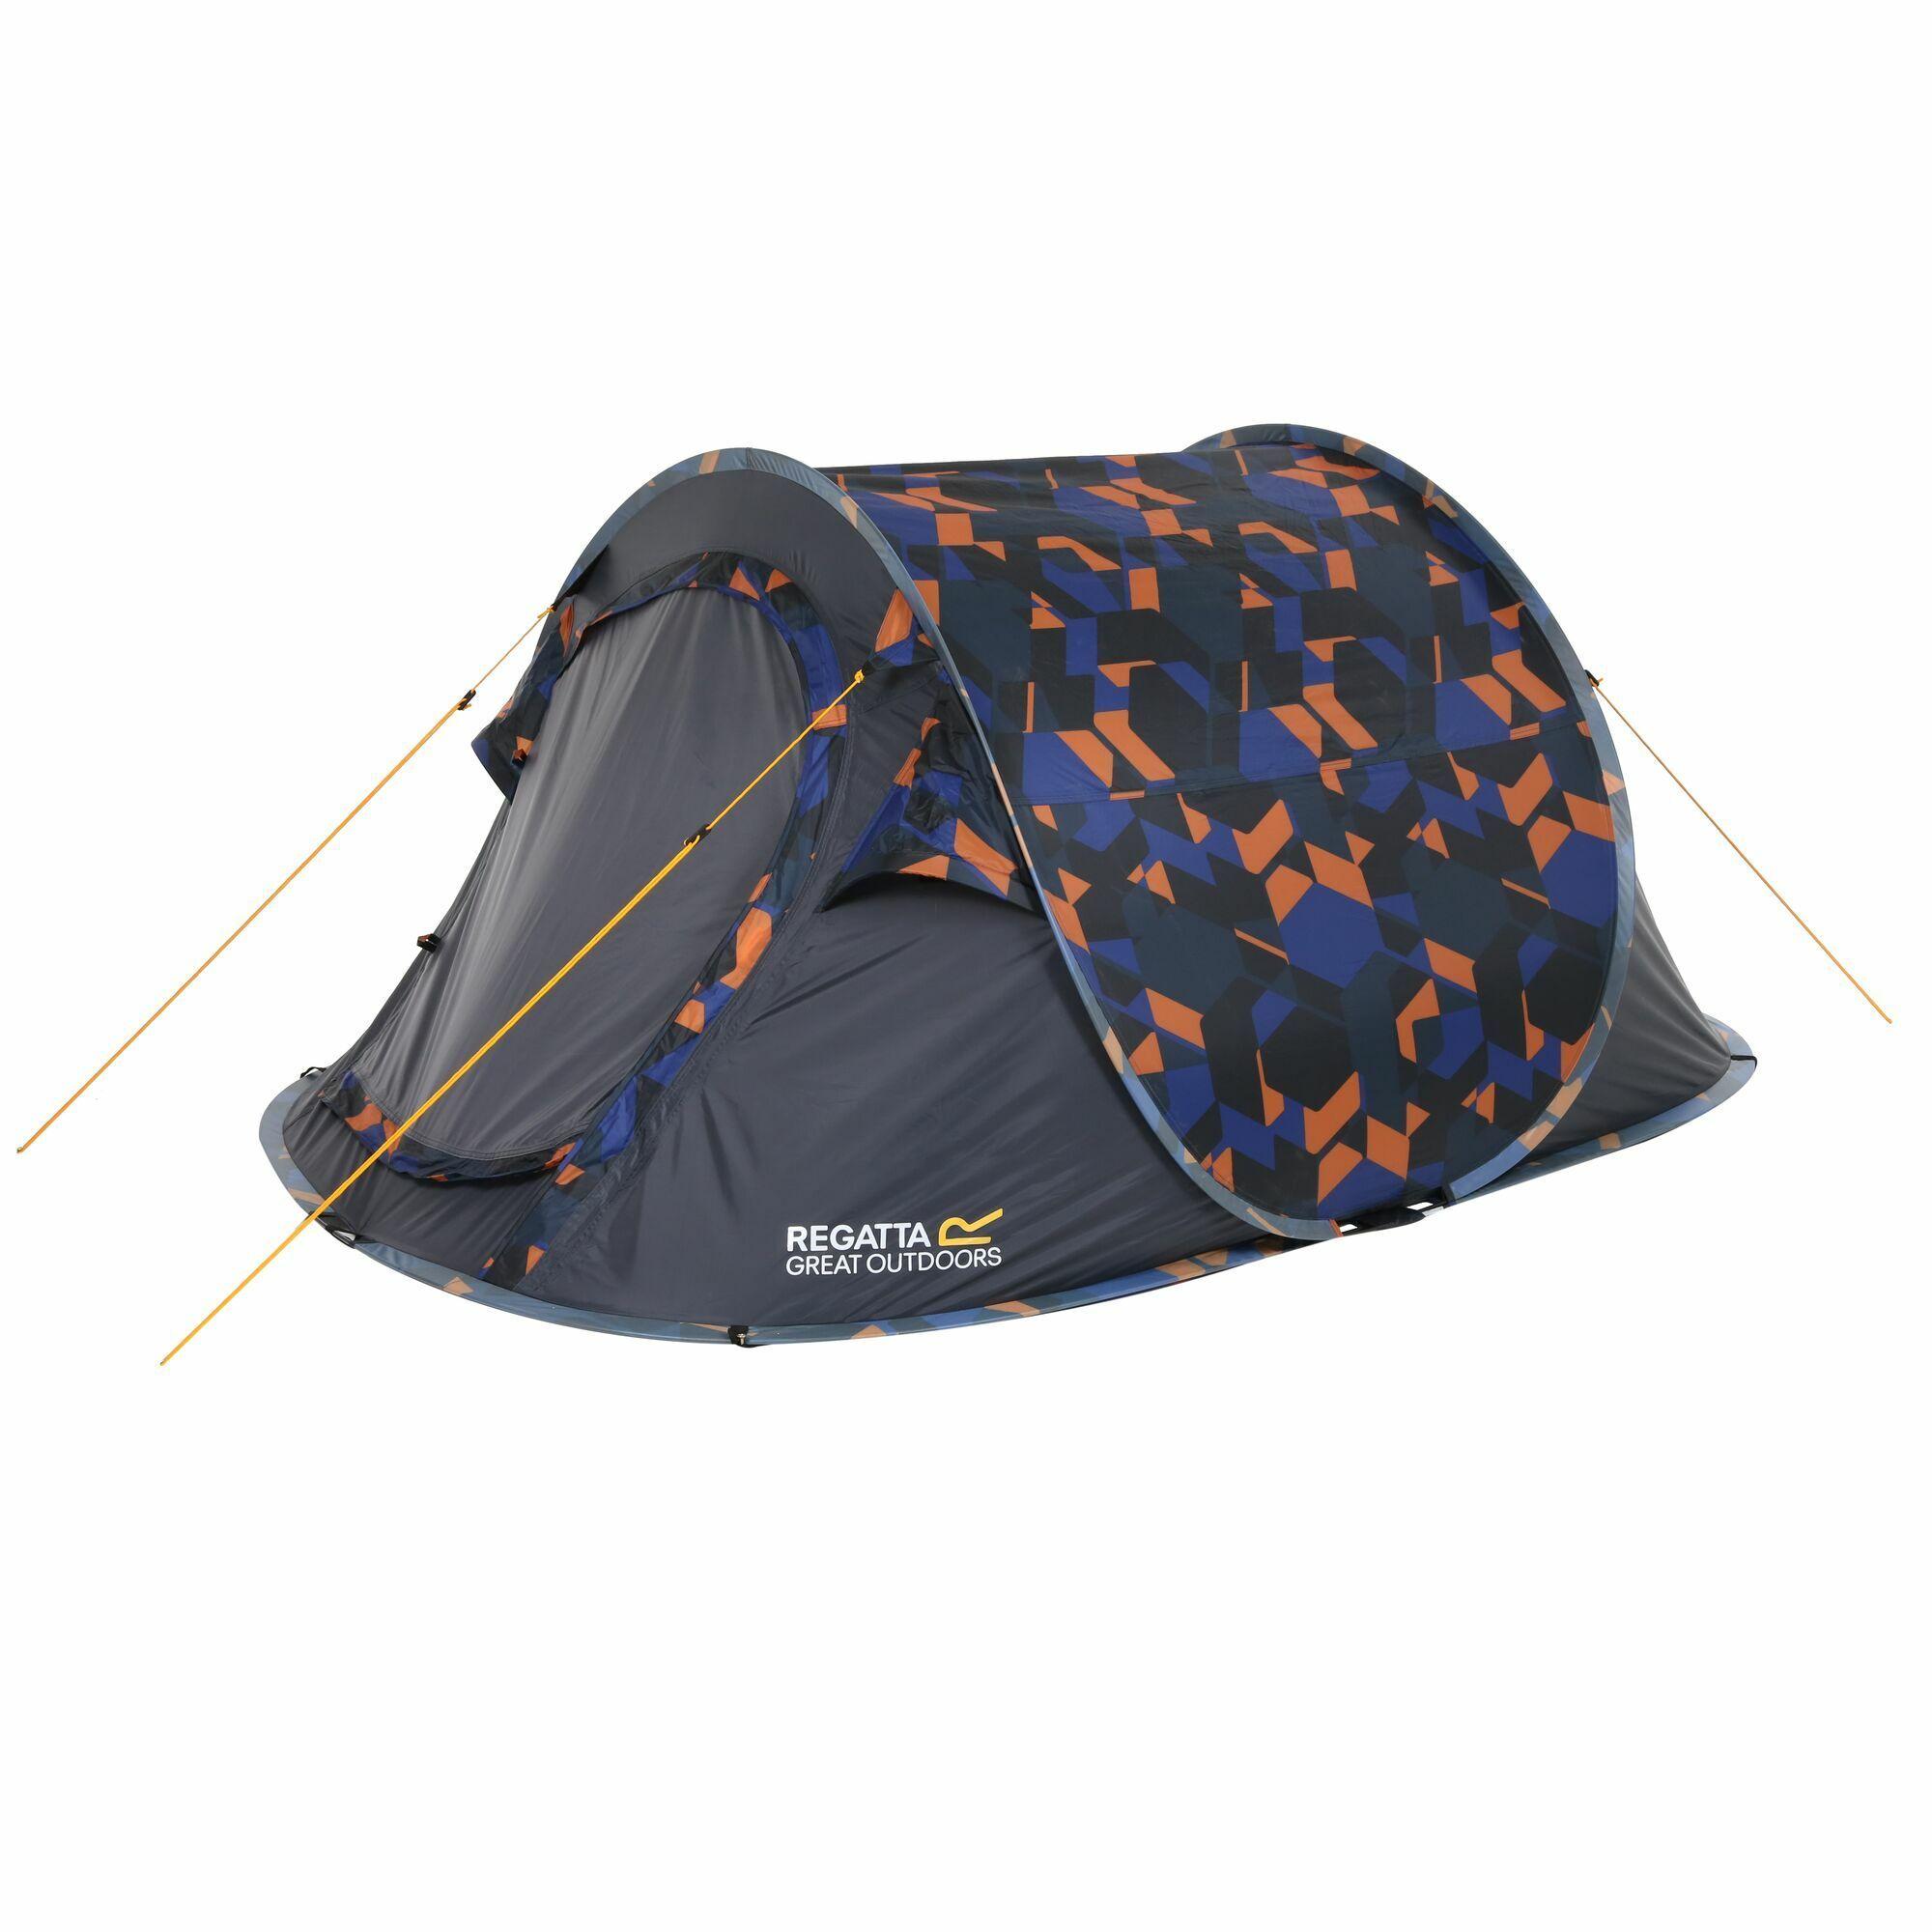 GEO Blue Orange Pop Up Tent